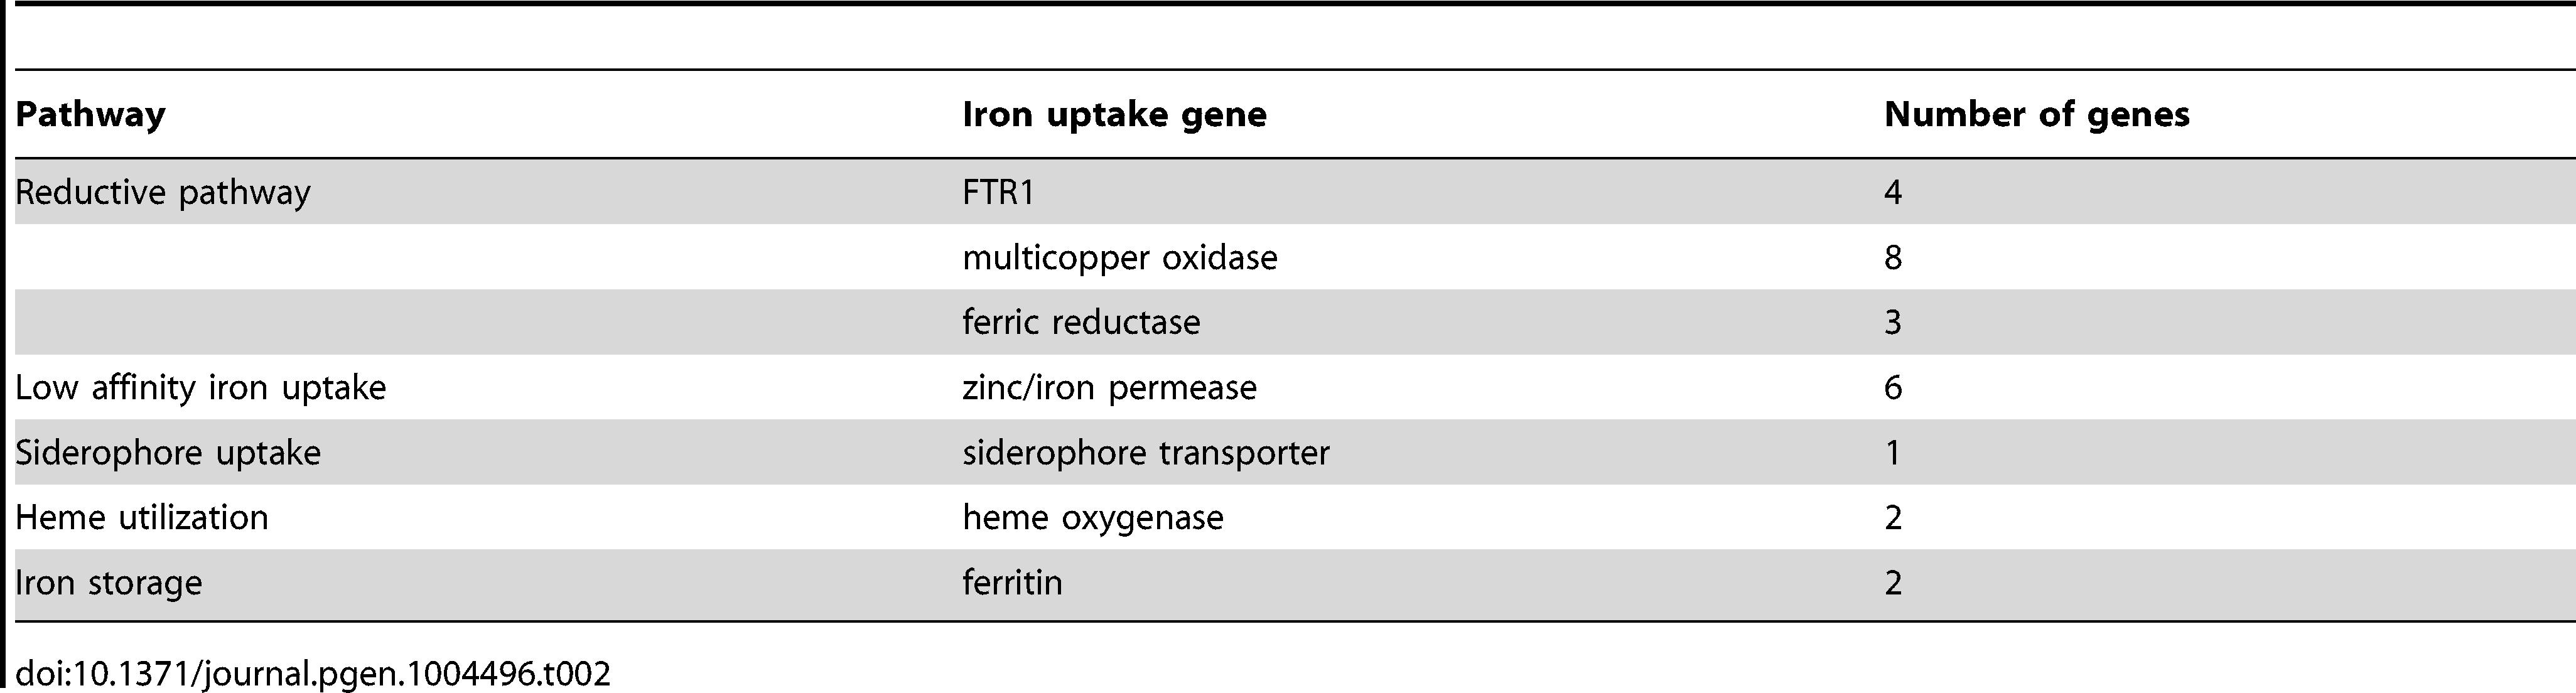 Iron uptake genes in the <i>L. corymbifera</i> genome.